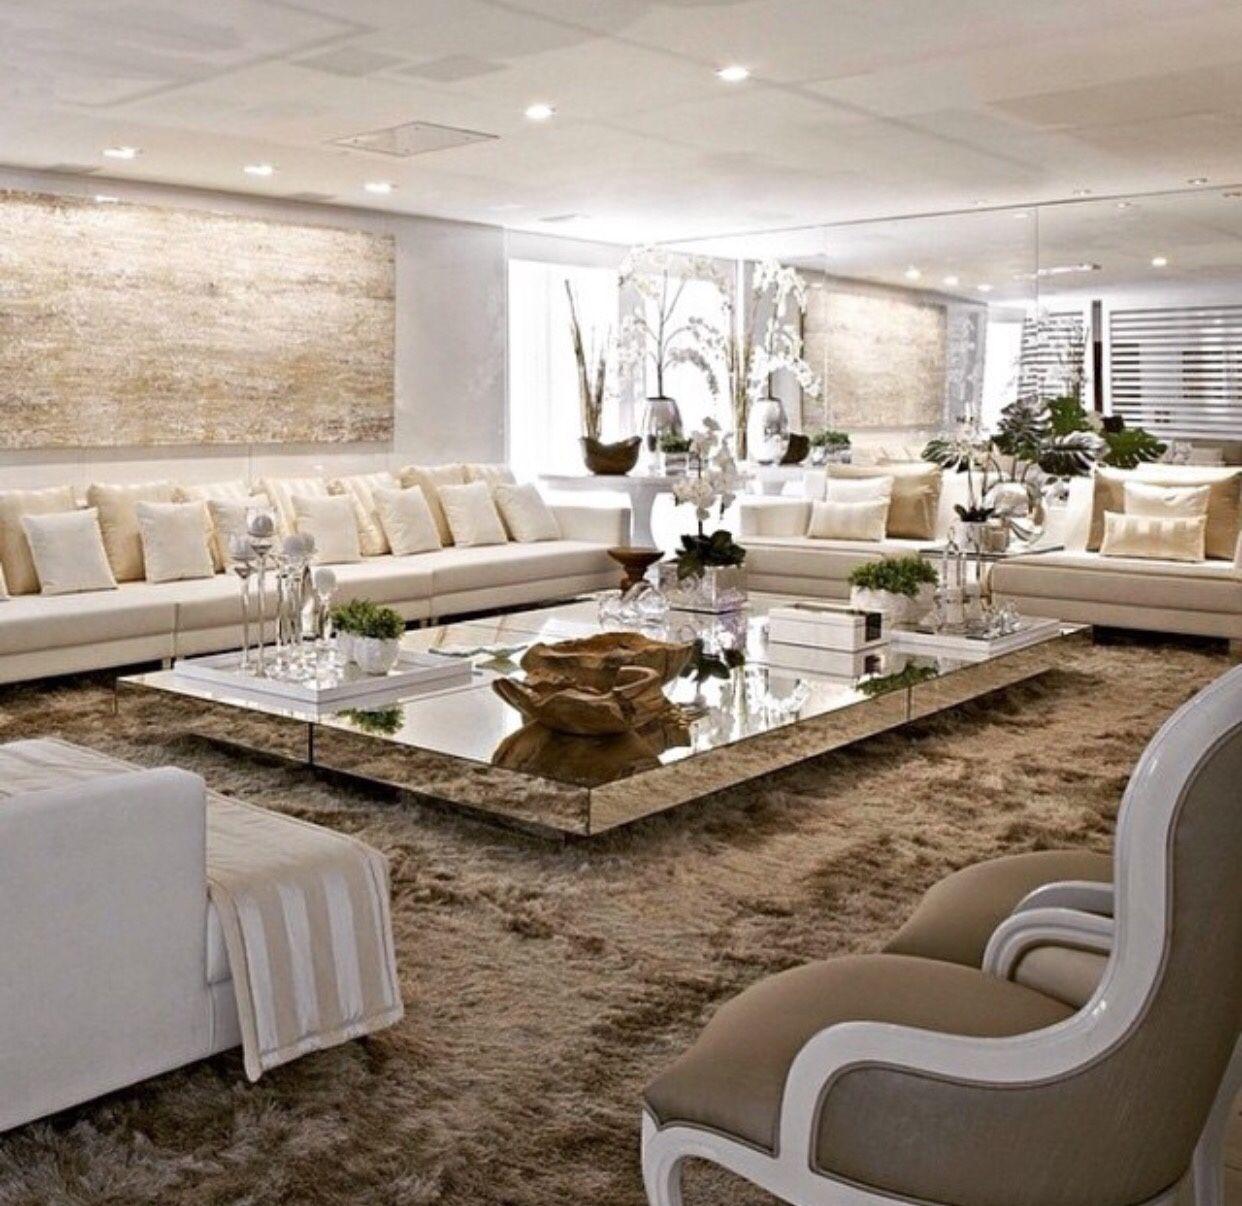 Luxury Living Room Big Dreams Luxury Taste Bocadolobo Com Livingroomideas Livingroomdecor Deco Maison Deco Salon Idee Deco Salon